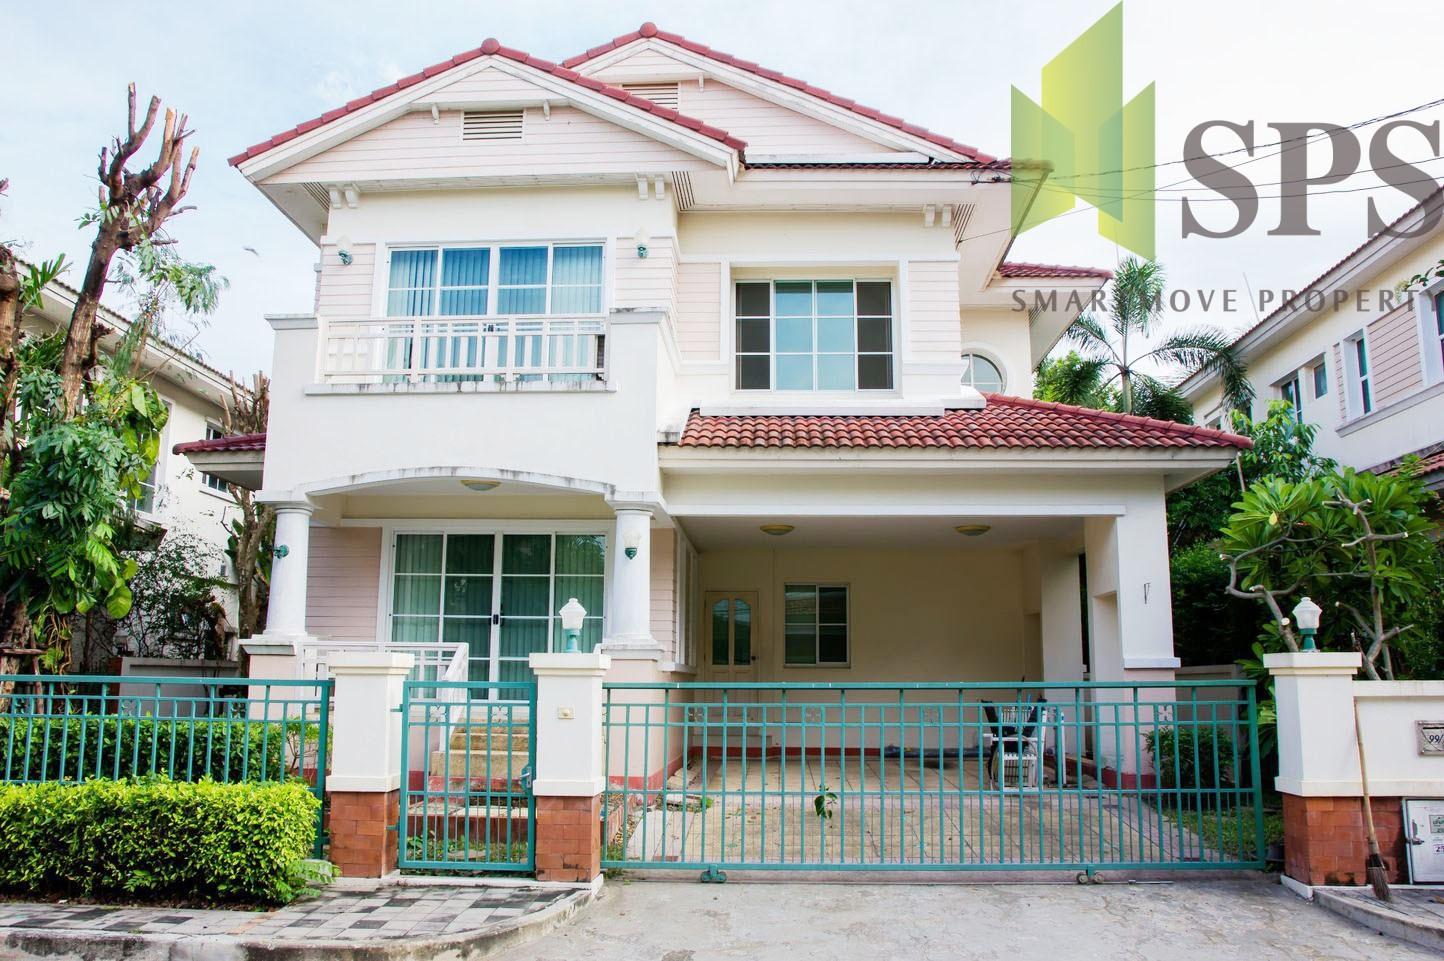 For Rent Single House Manthana Onnut – Wongwan 1 บ้านให้เช่าโครงการมัณฑนา1 อ่อนนุช-วงแหวน ( SPSPE312)